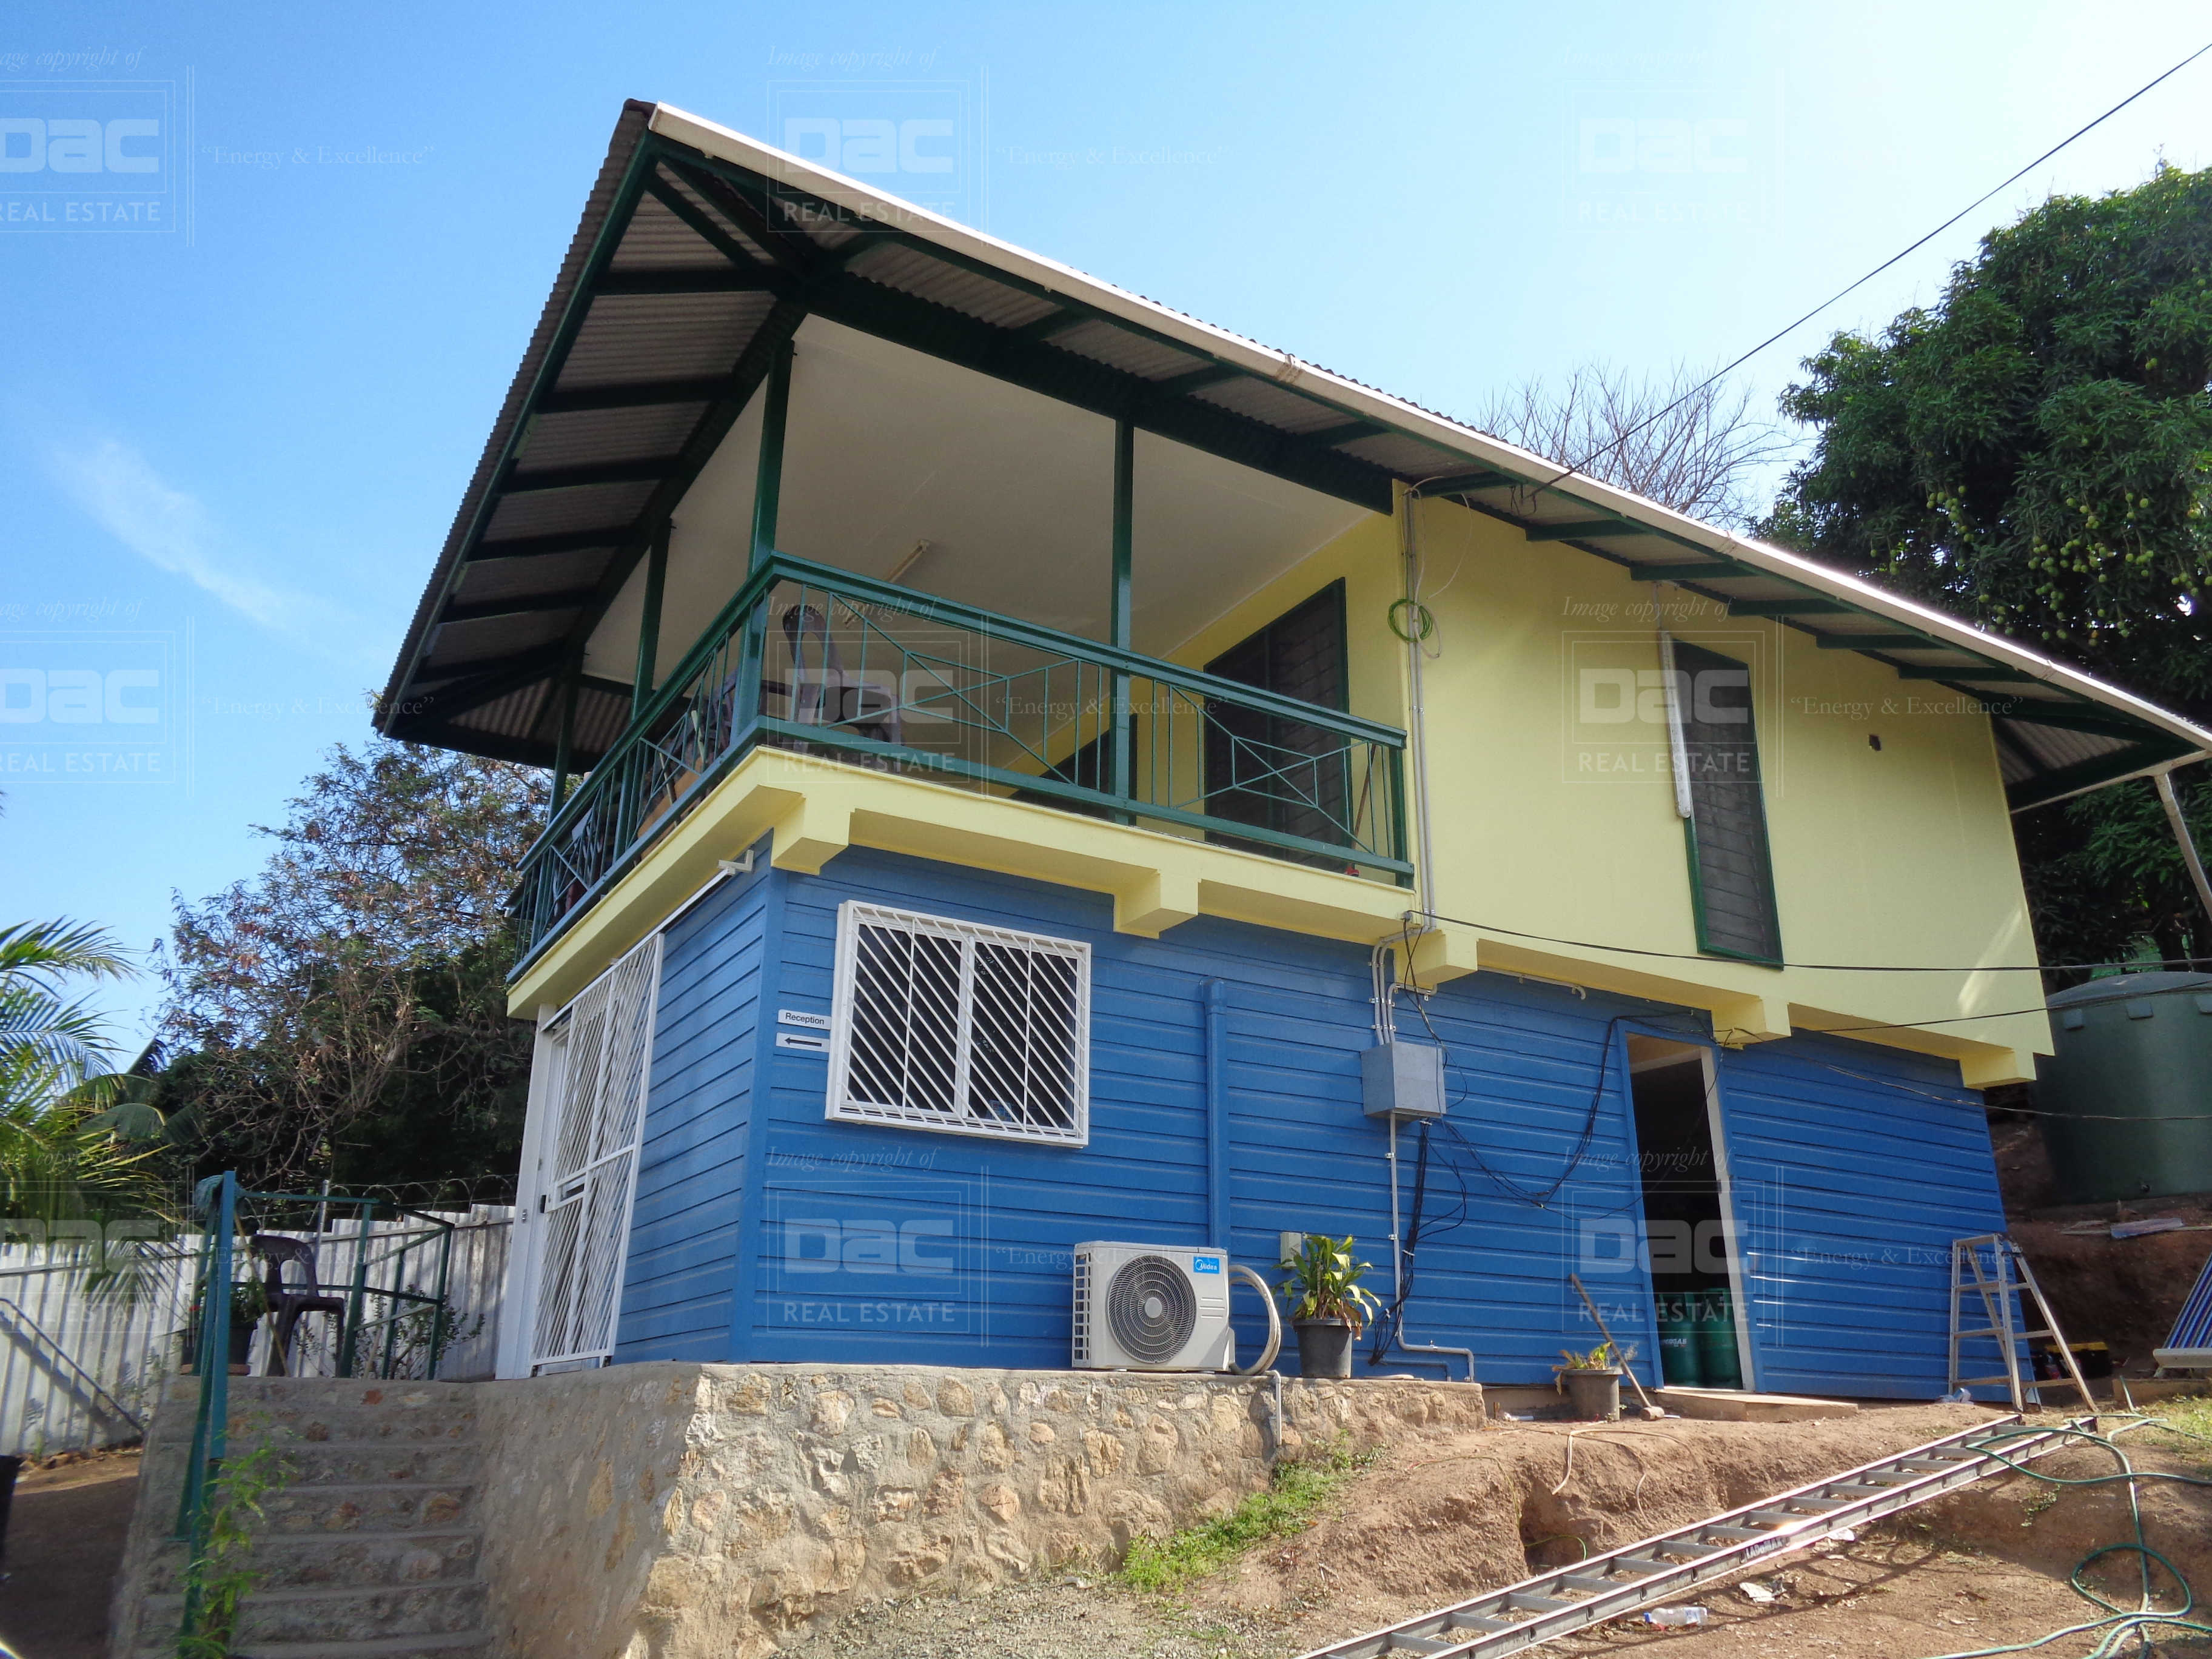 OA477: House In Waigani